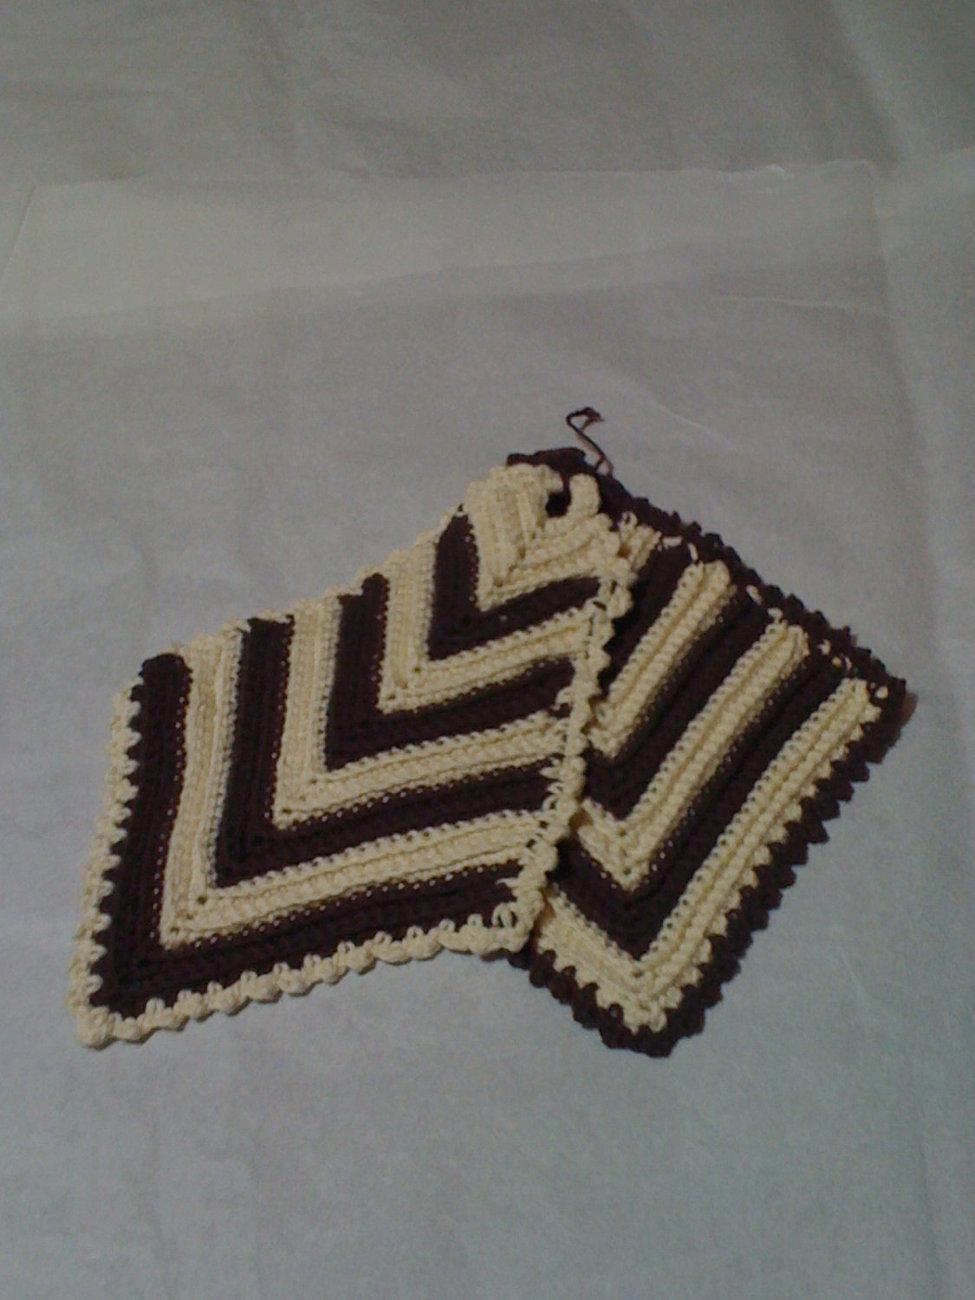 Hand crocheted brown/cream potholder set